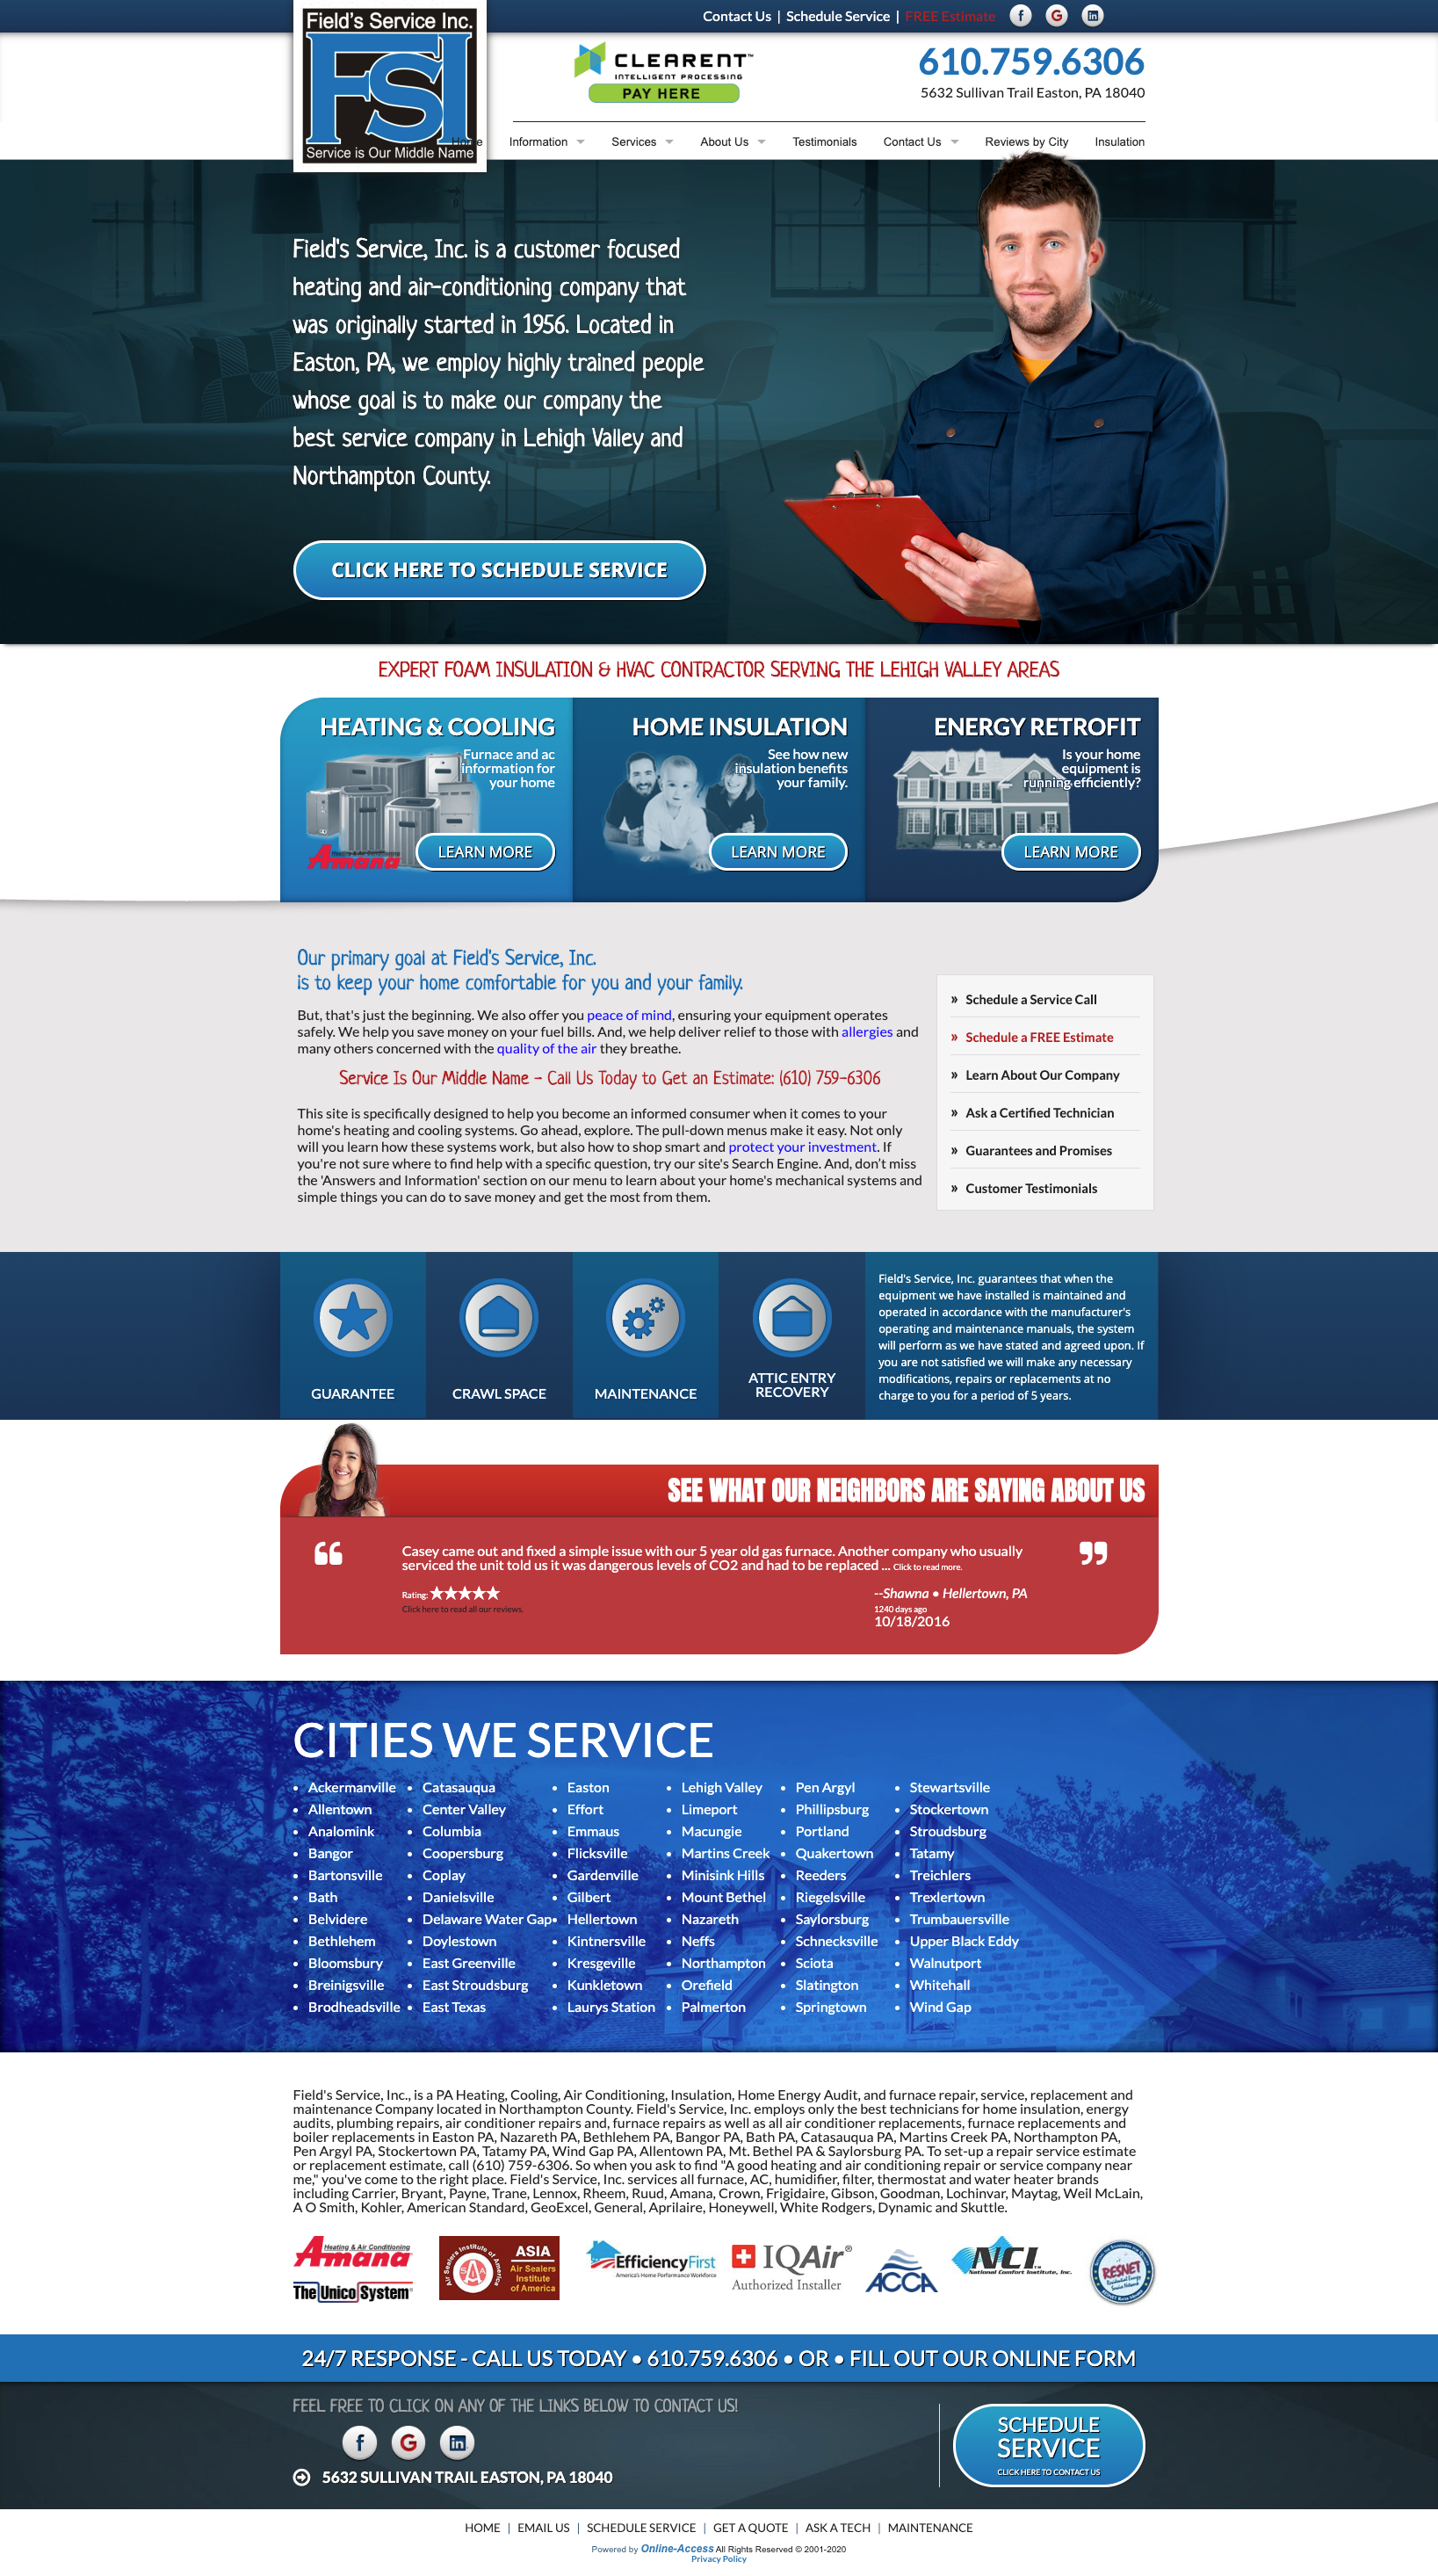 Modern Website Design In 2020 Heating And Air Conditioning Air Conditioning Companies Modern Website Design